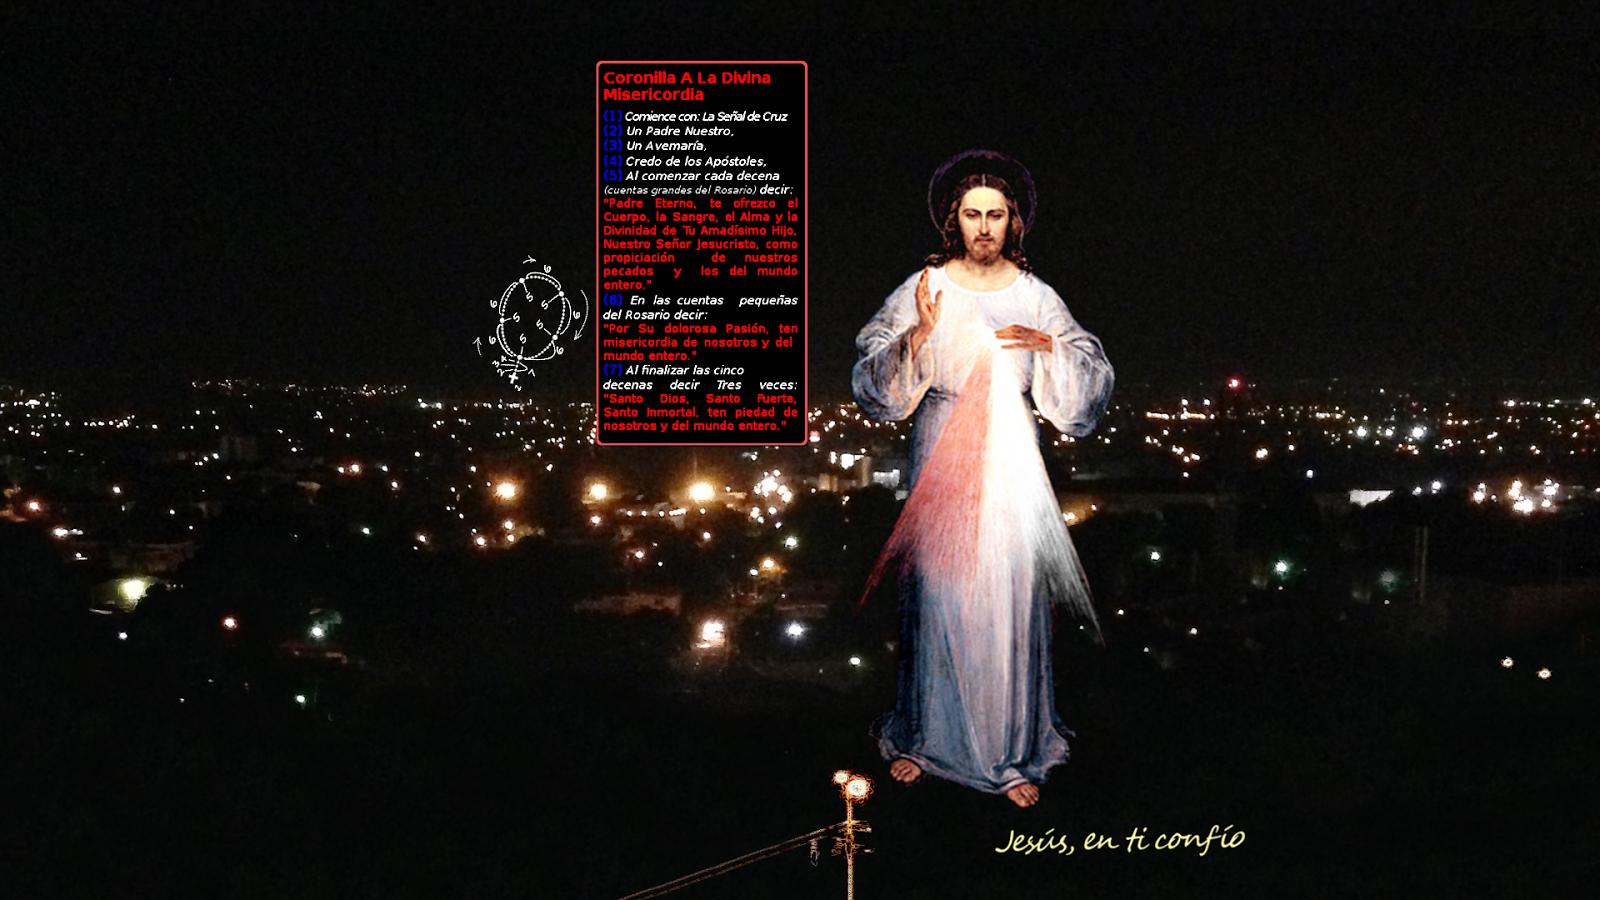 divina misericordia pide recemos la coronilla